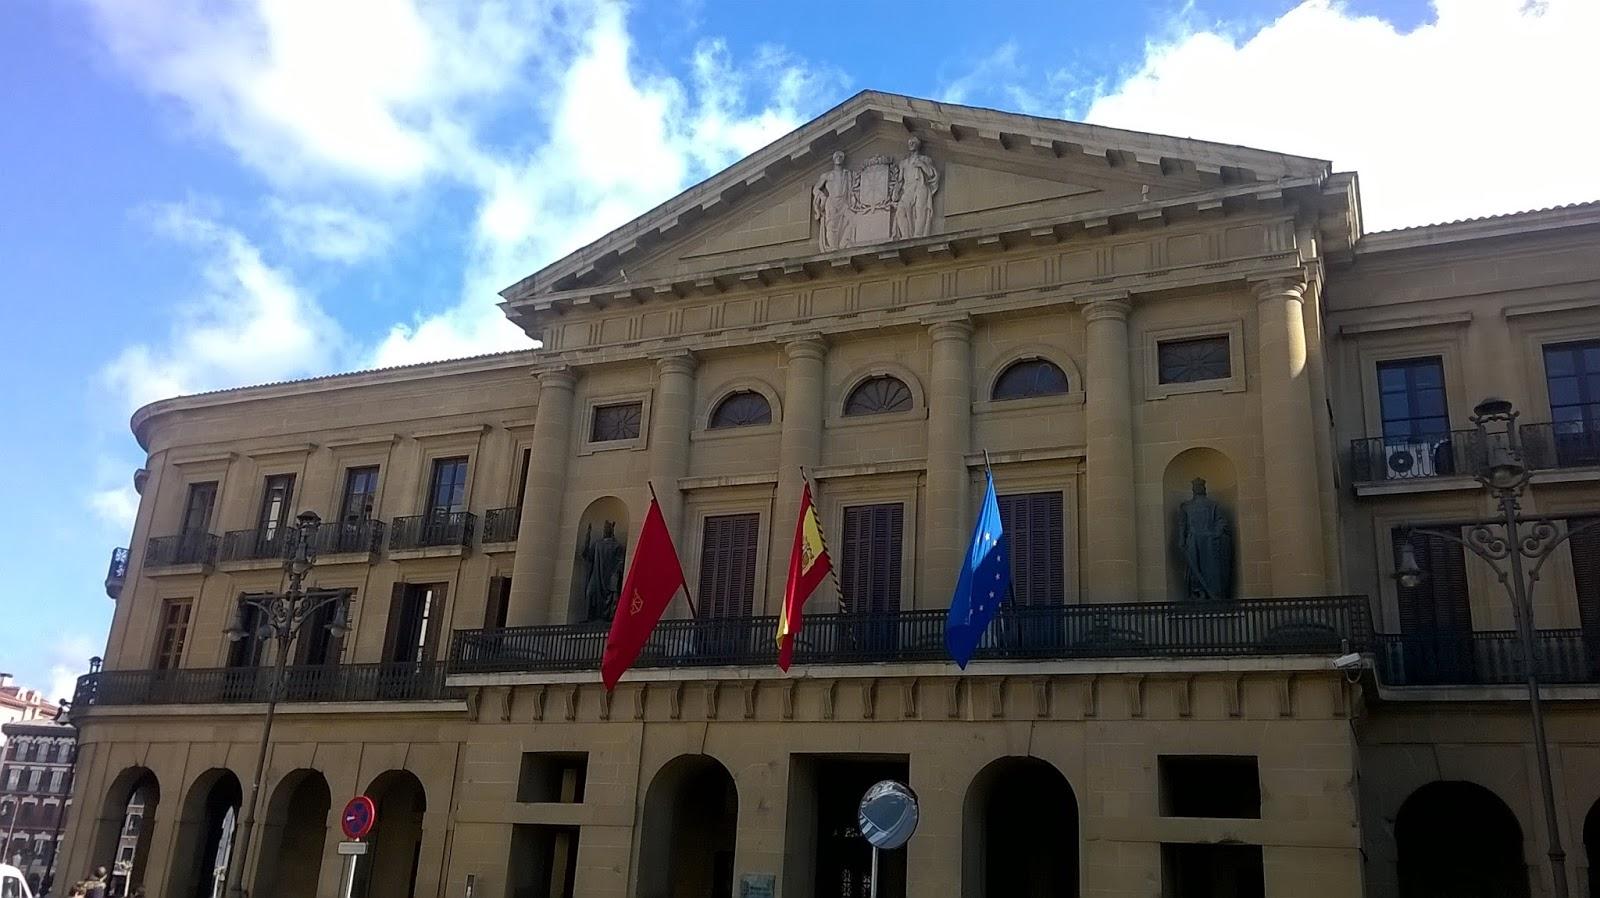 Navarra y pamplona espa a cuba febrero 2016 for Muebles rey navarra